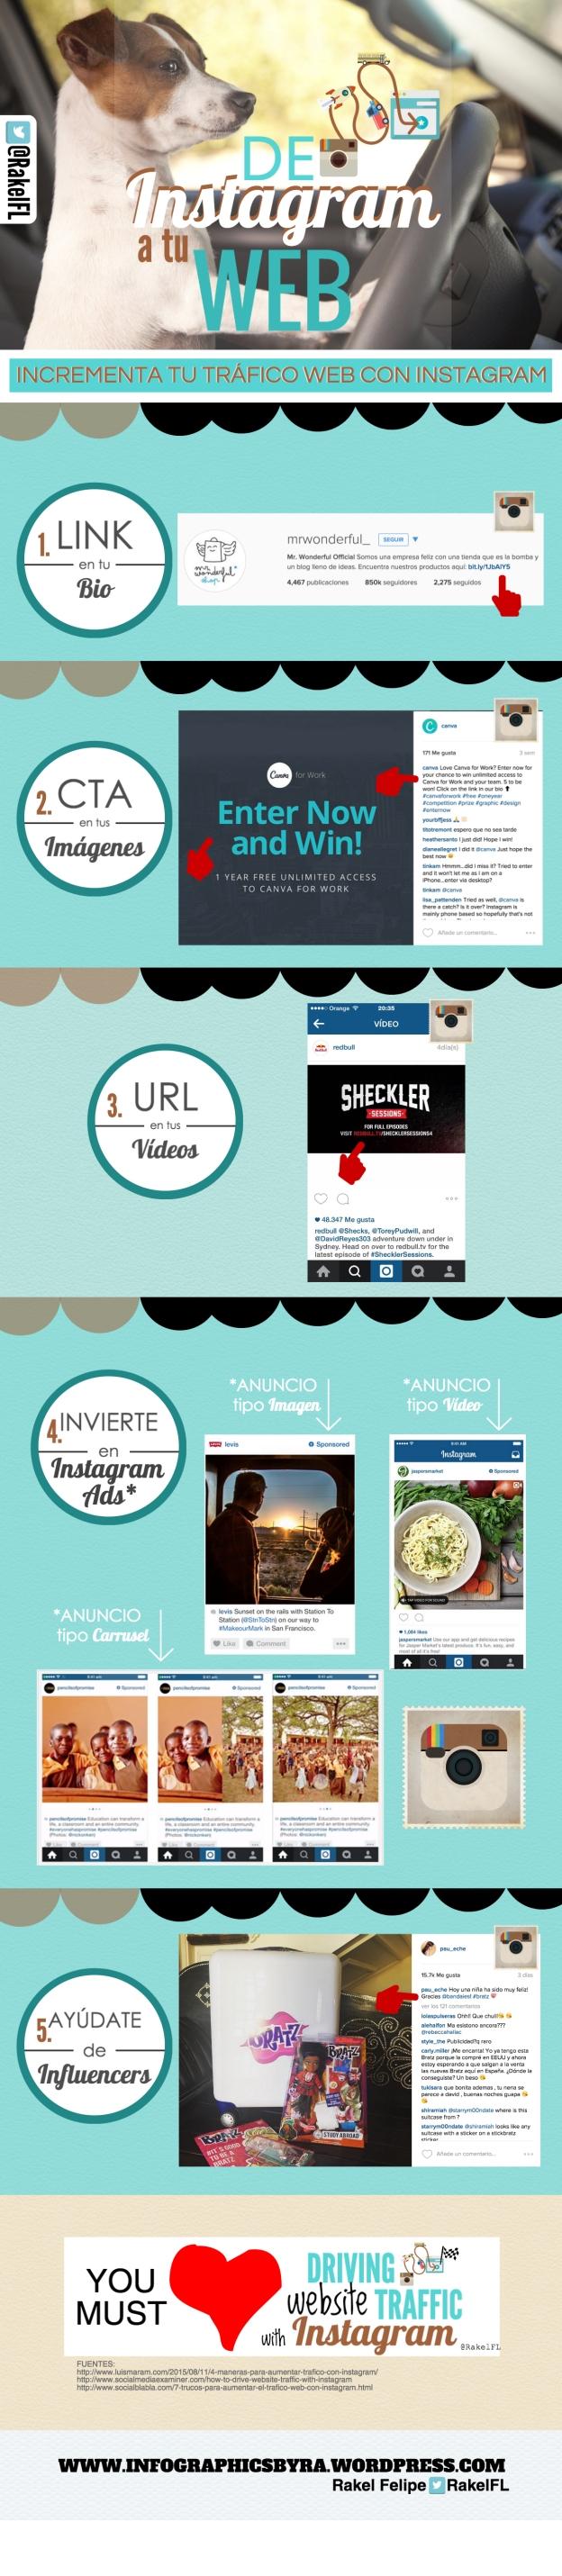 De Instagram a tu Web, infografía by Rakel Felipe